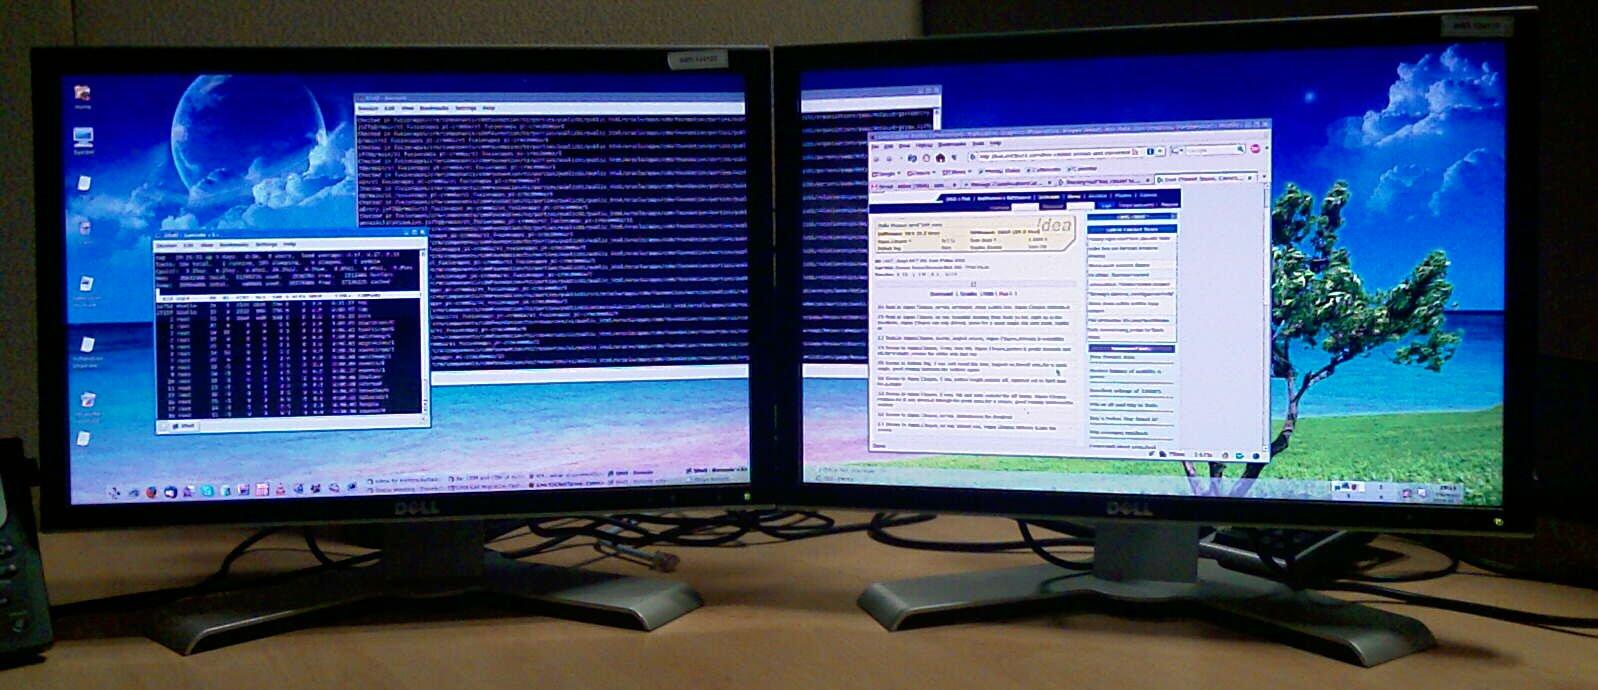 Windows and Android Free Downloads : Dual display setup windows 7